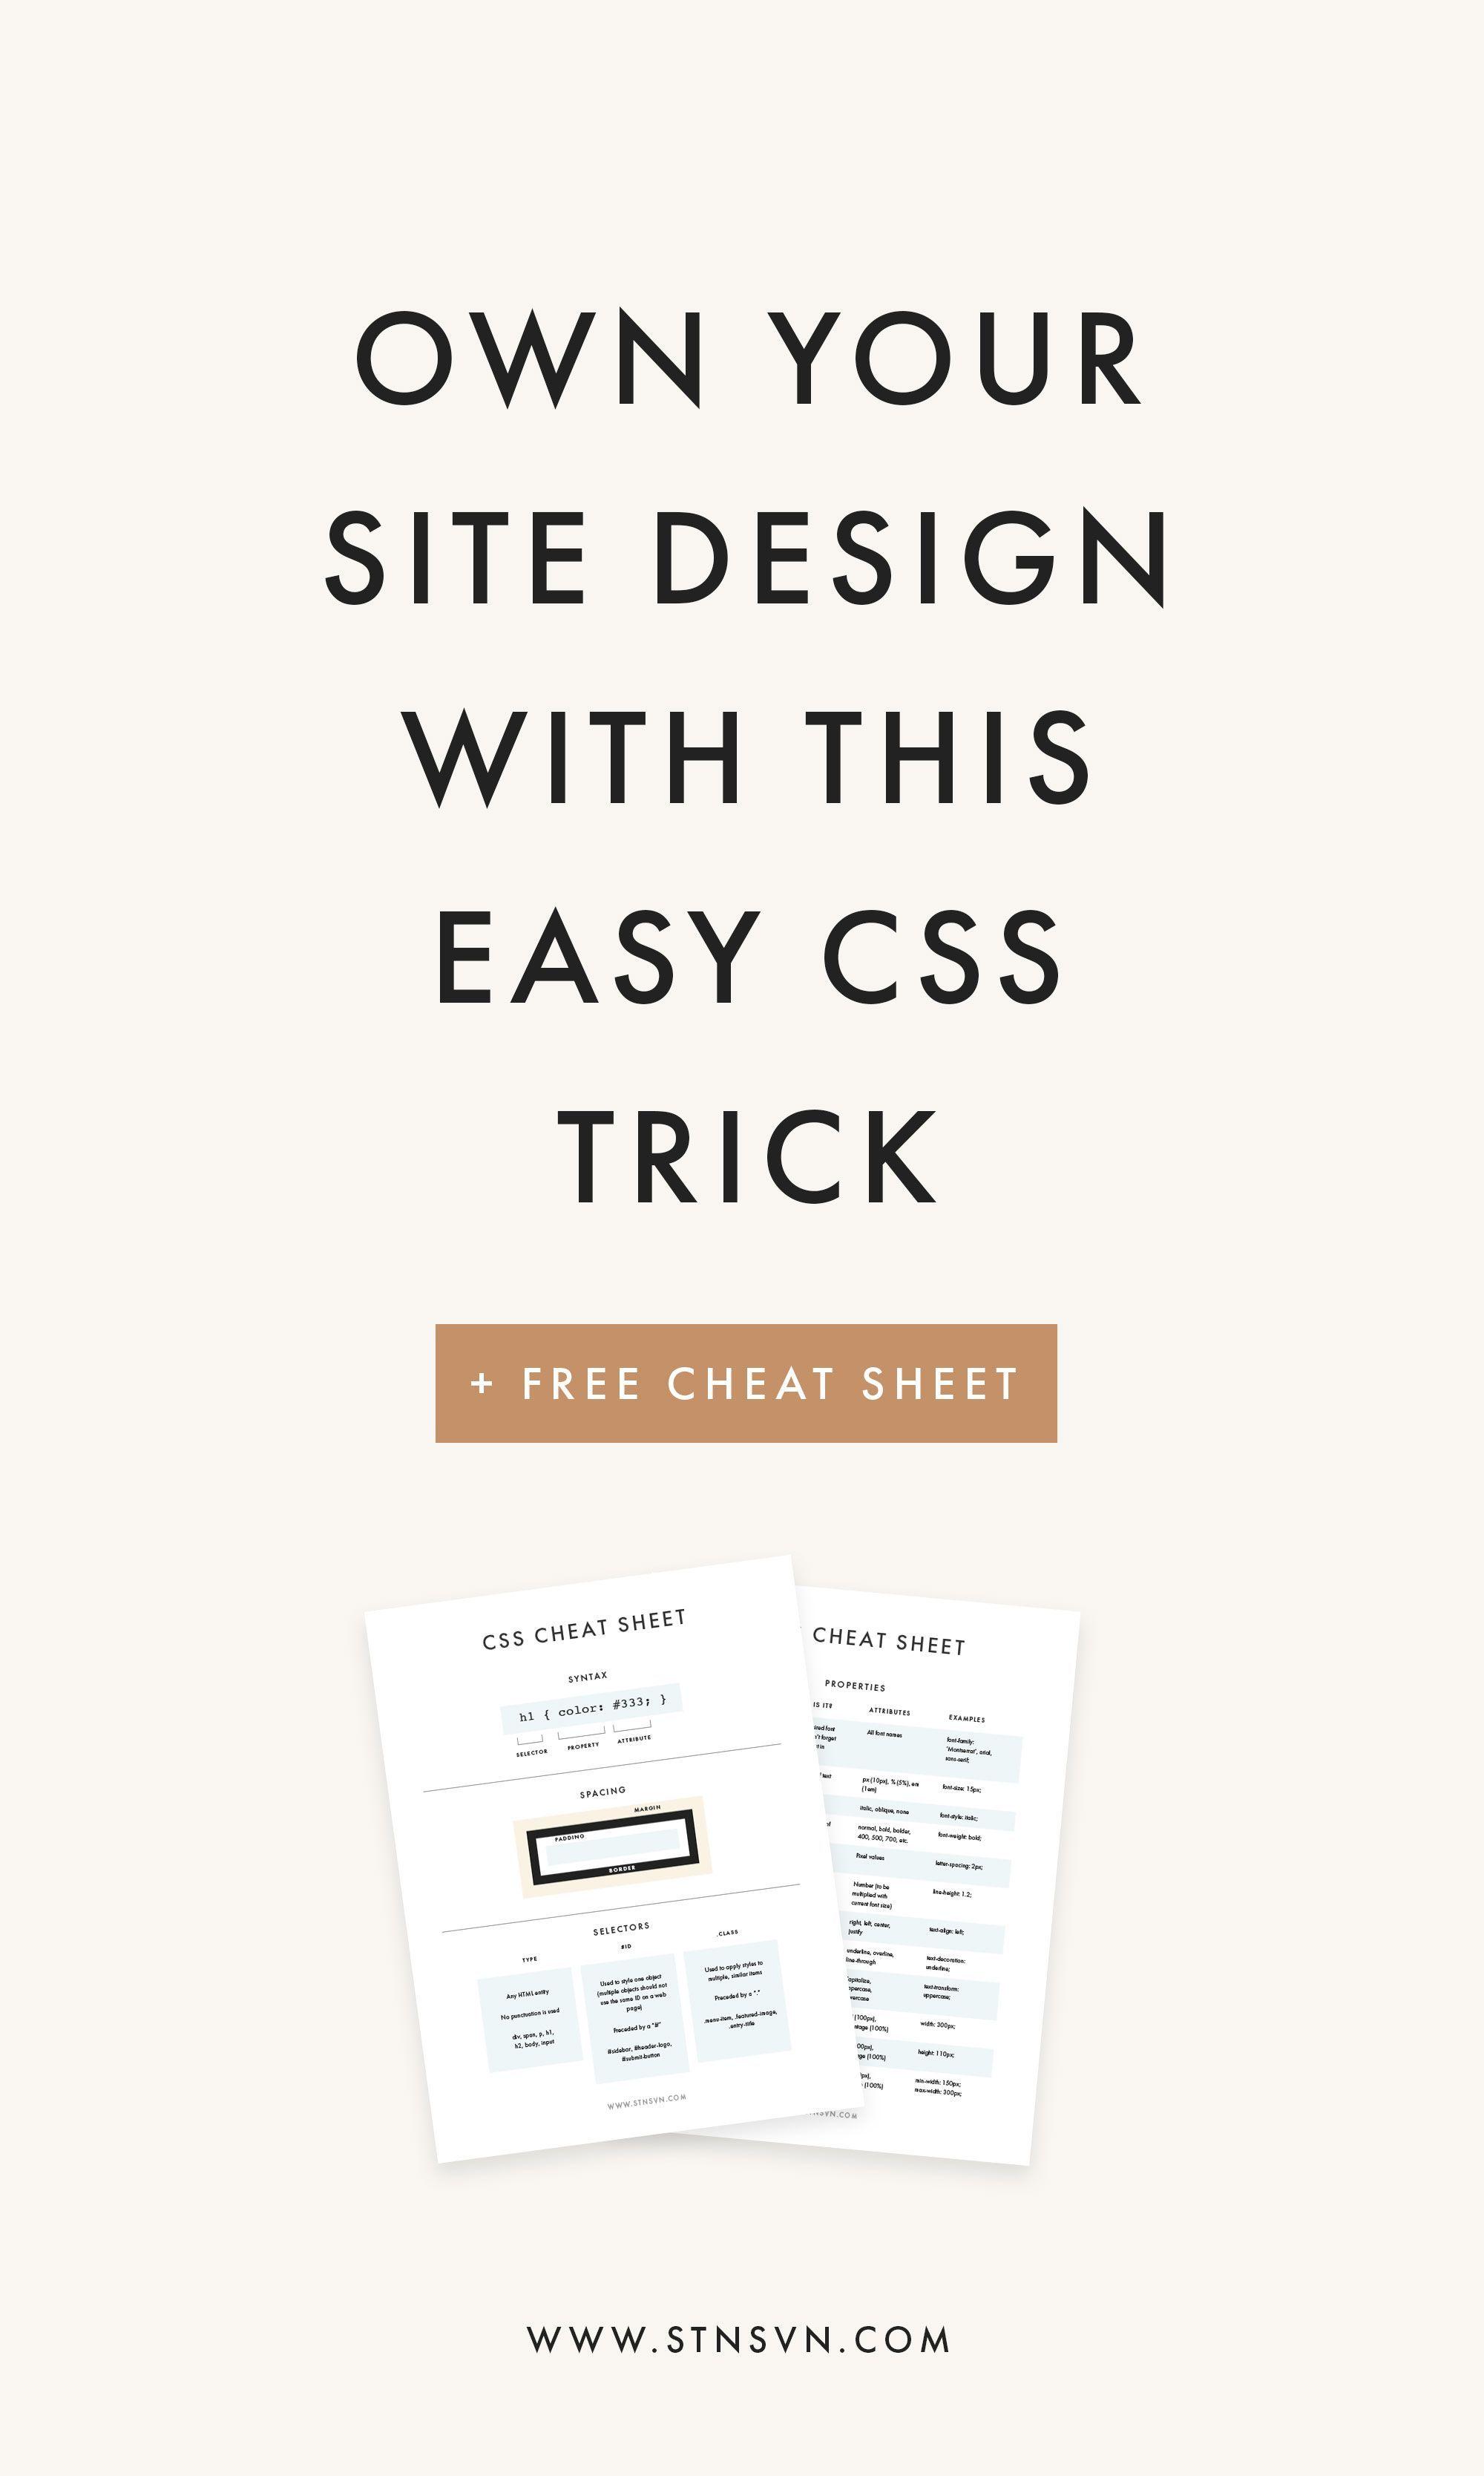 Css Cheat Sheet Web Design Resources Website Design Branding Tips Blogging For Beginners Css Cheat Sheet Web Design Tips Site Design